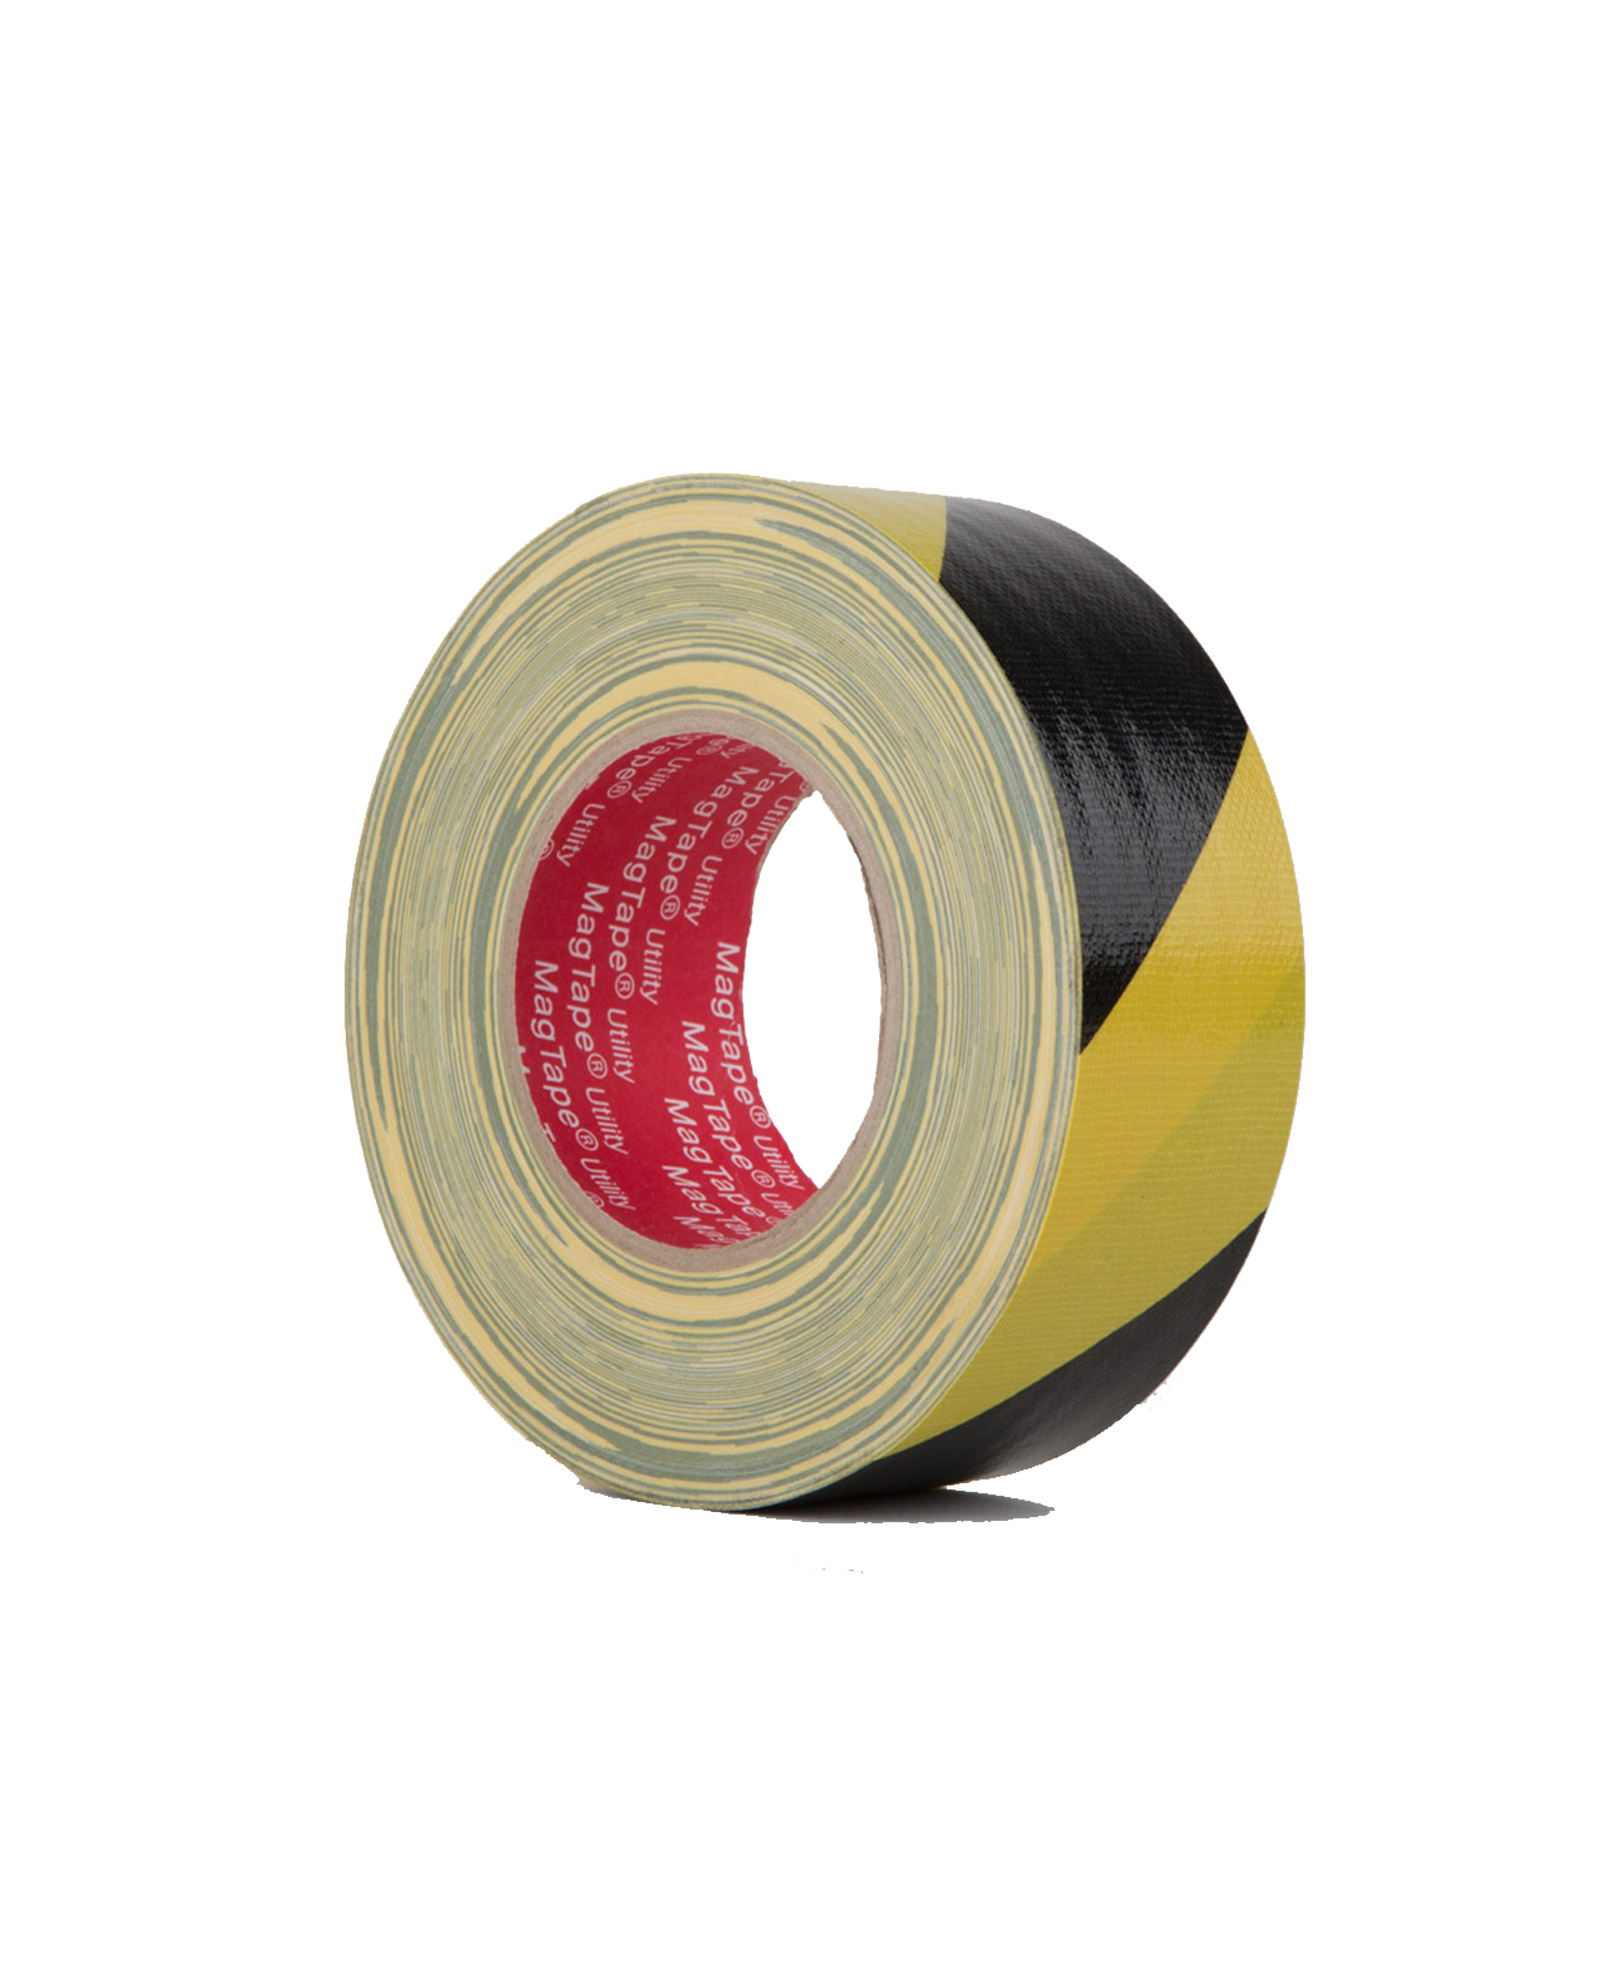 Le Mark Hazard Magtape Utility Gaffer Tape